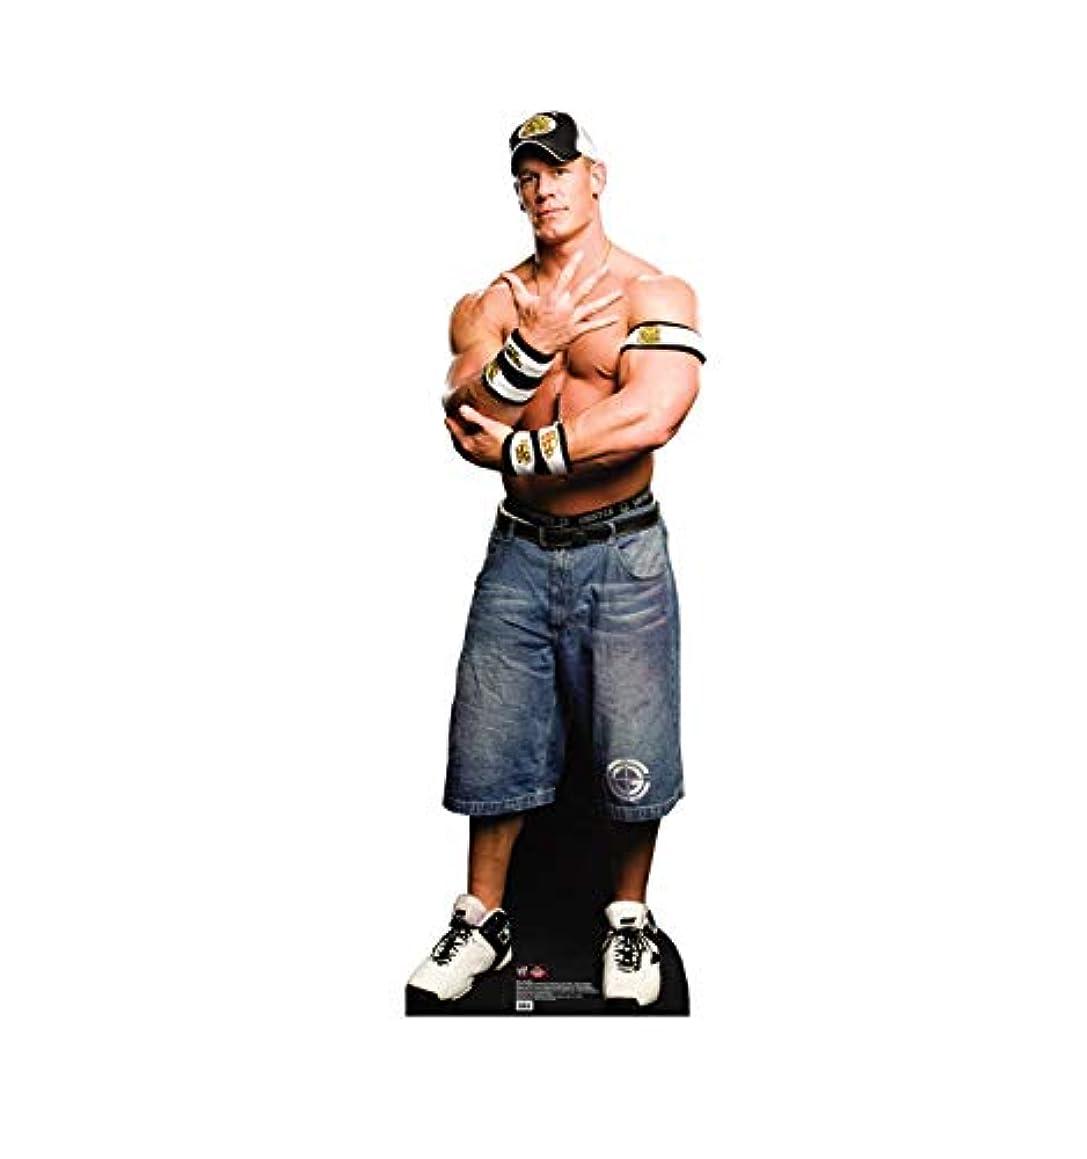 Advanced Graphics John Cena Life Size Cardboard Cutout Standup - WWE